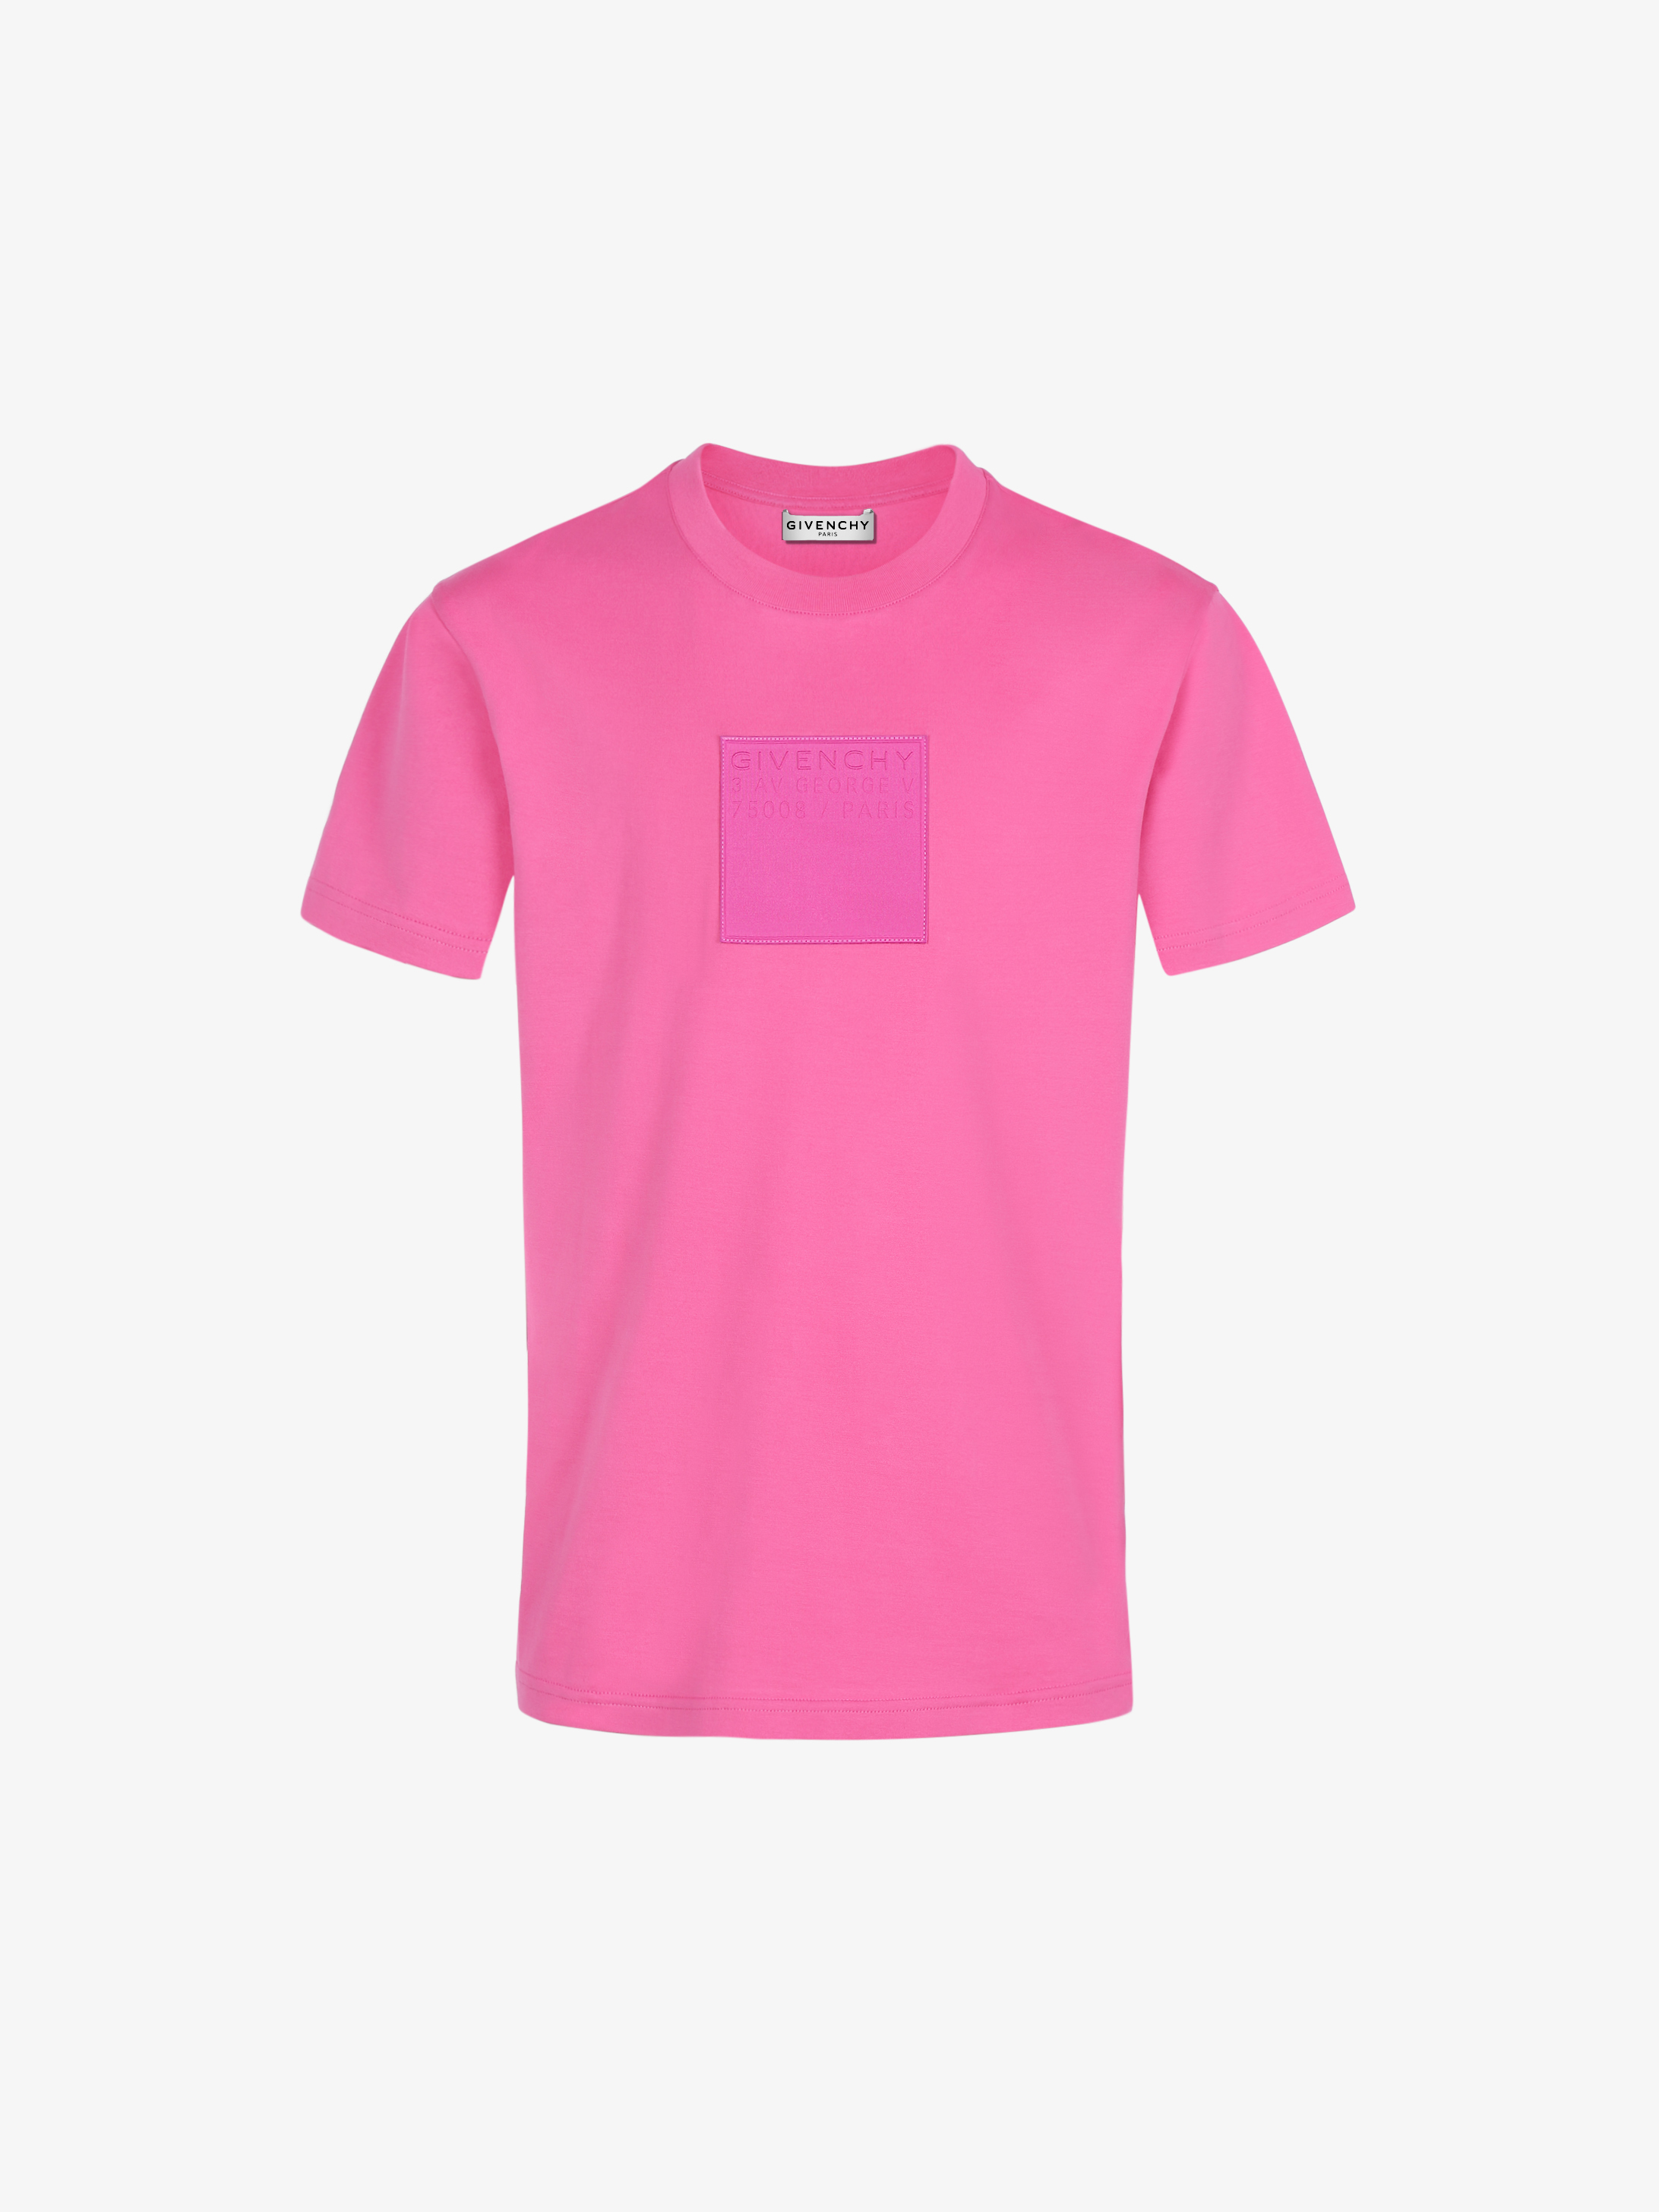 GIVENCHY ADDRESS patch slim fit t-shirt